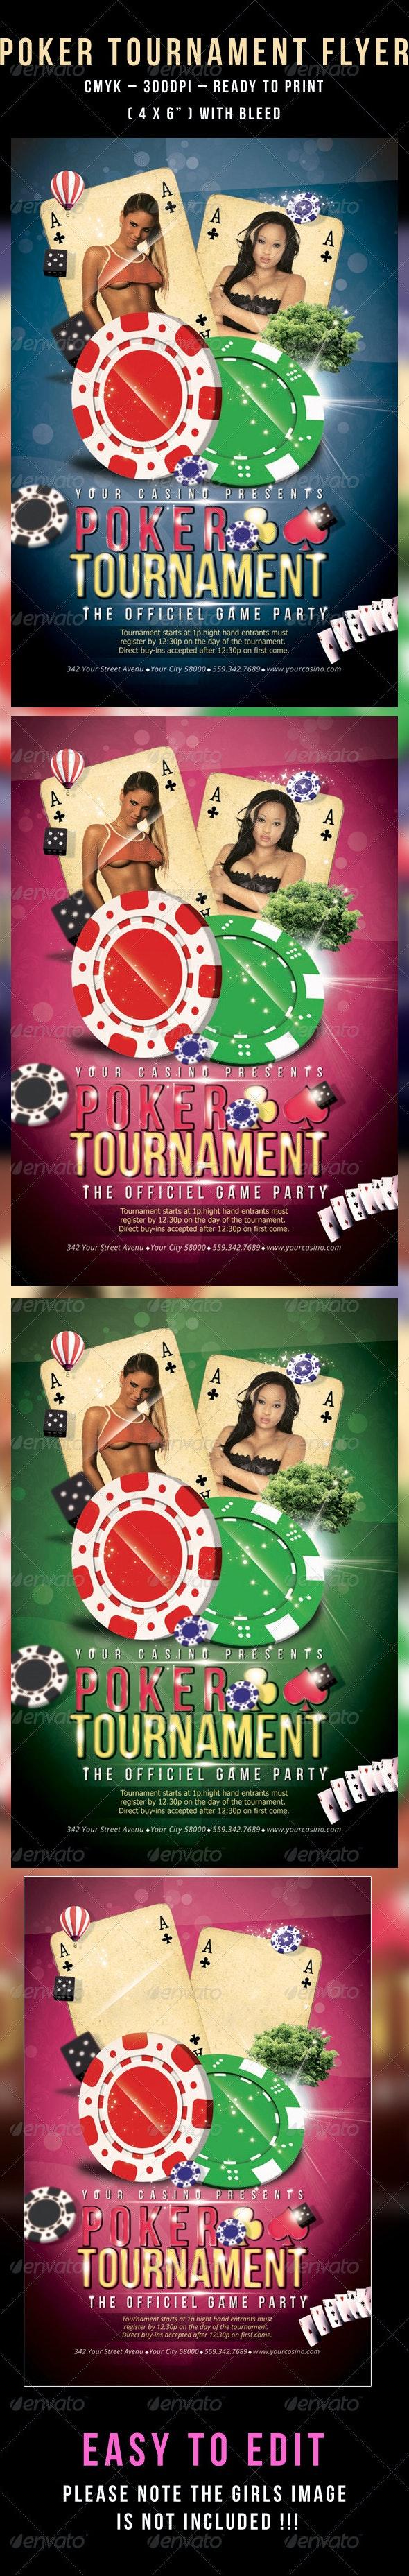 Poker Tournament Flyer - Flyers Print Templates